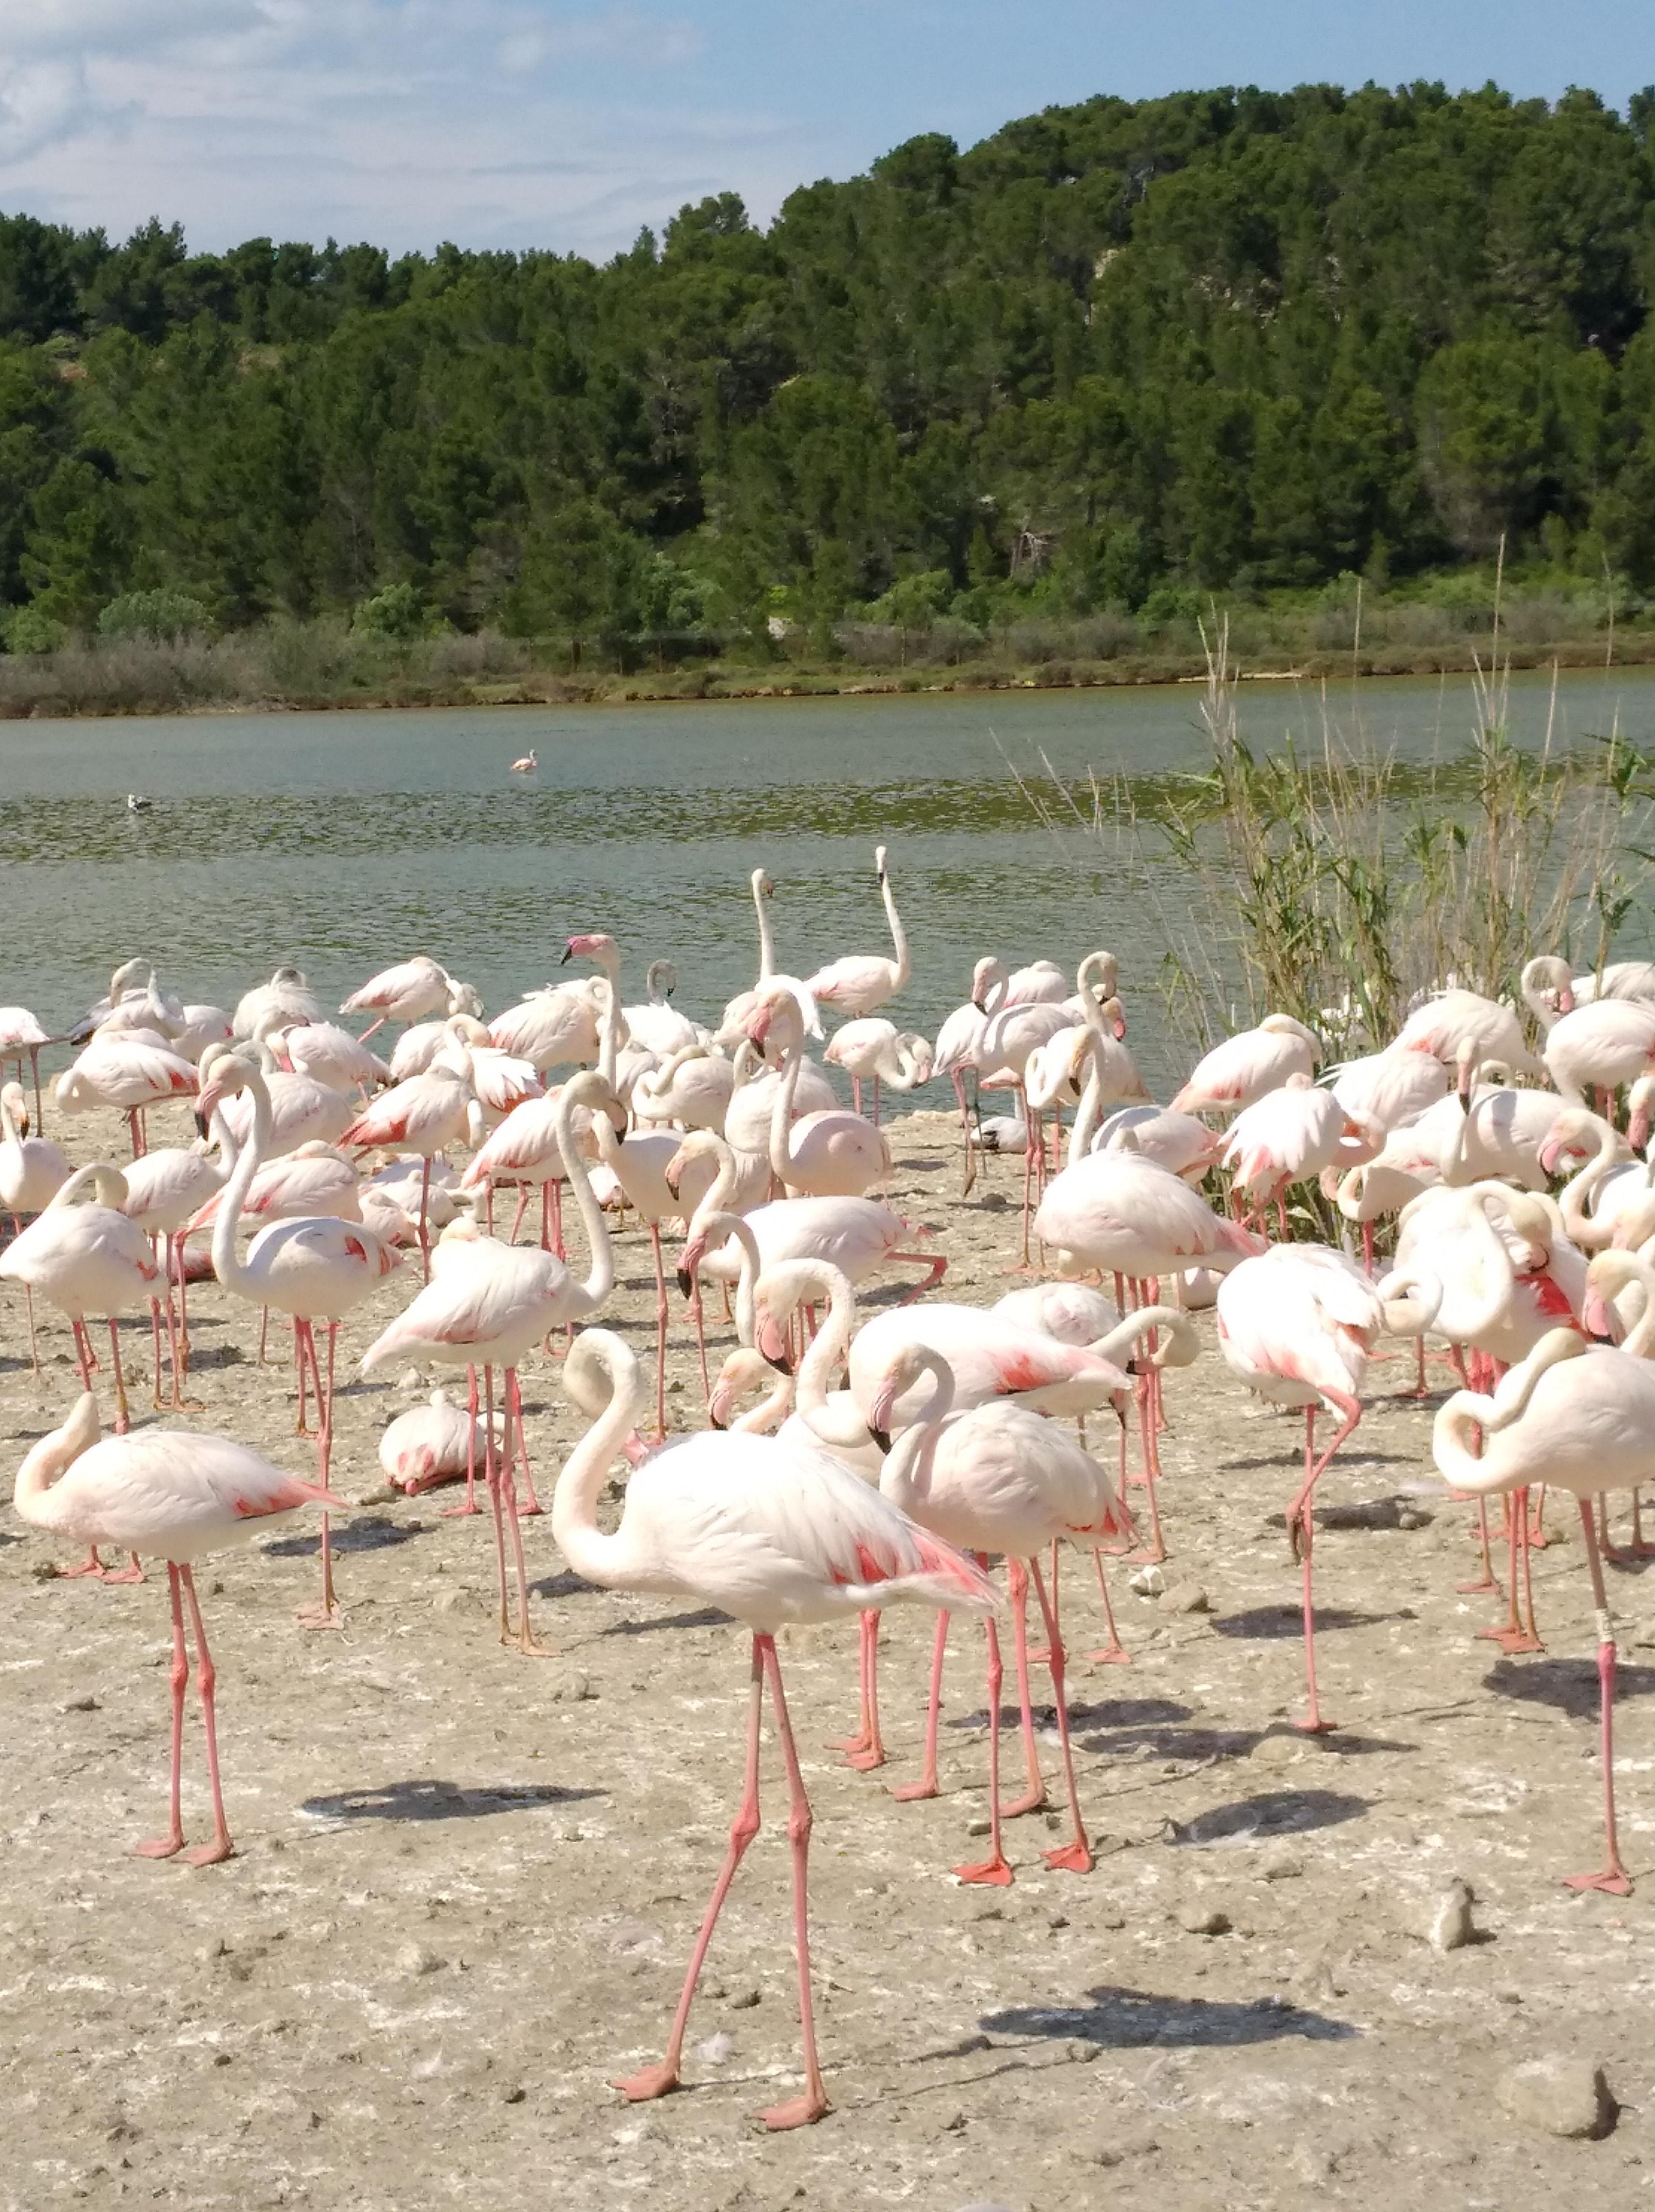 Free stock photo of nature park, pink flamingo near salted pond, wild animals